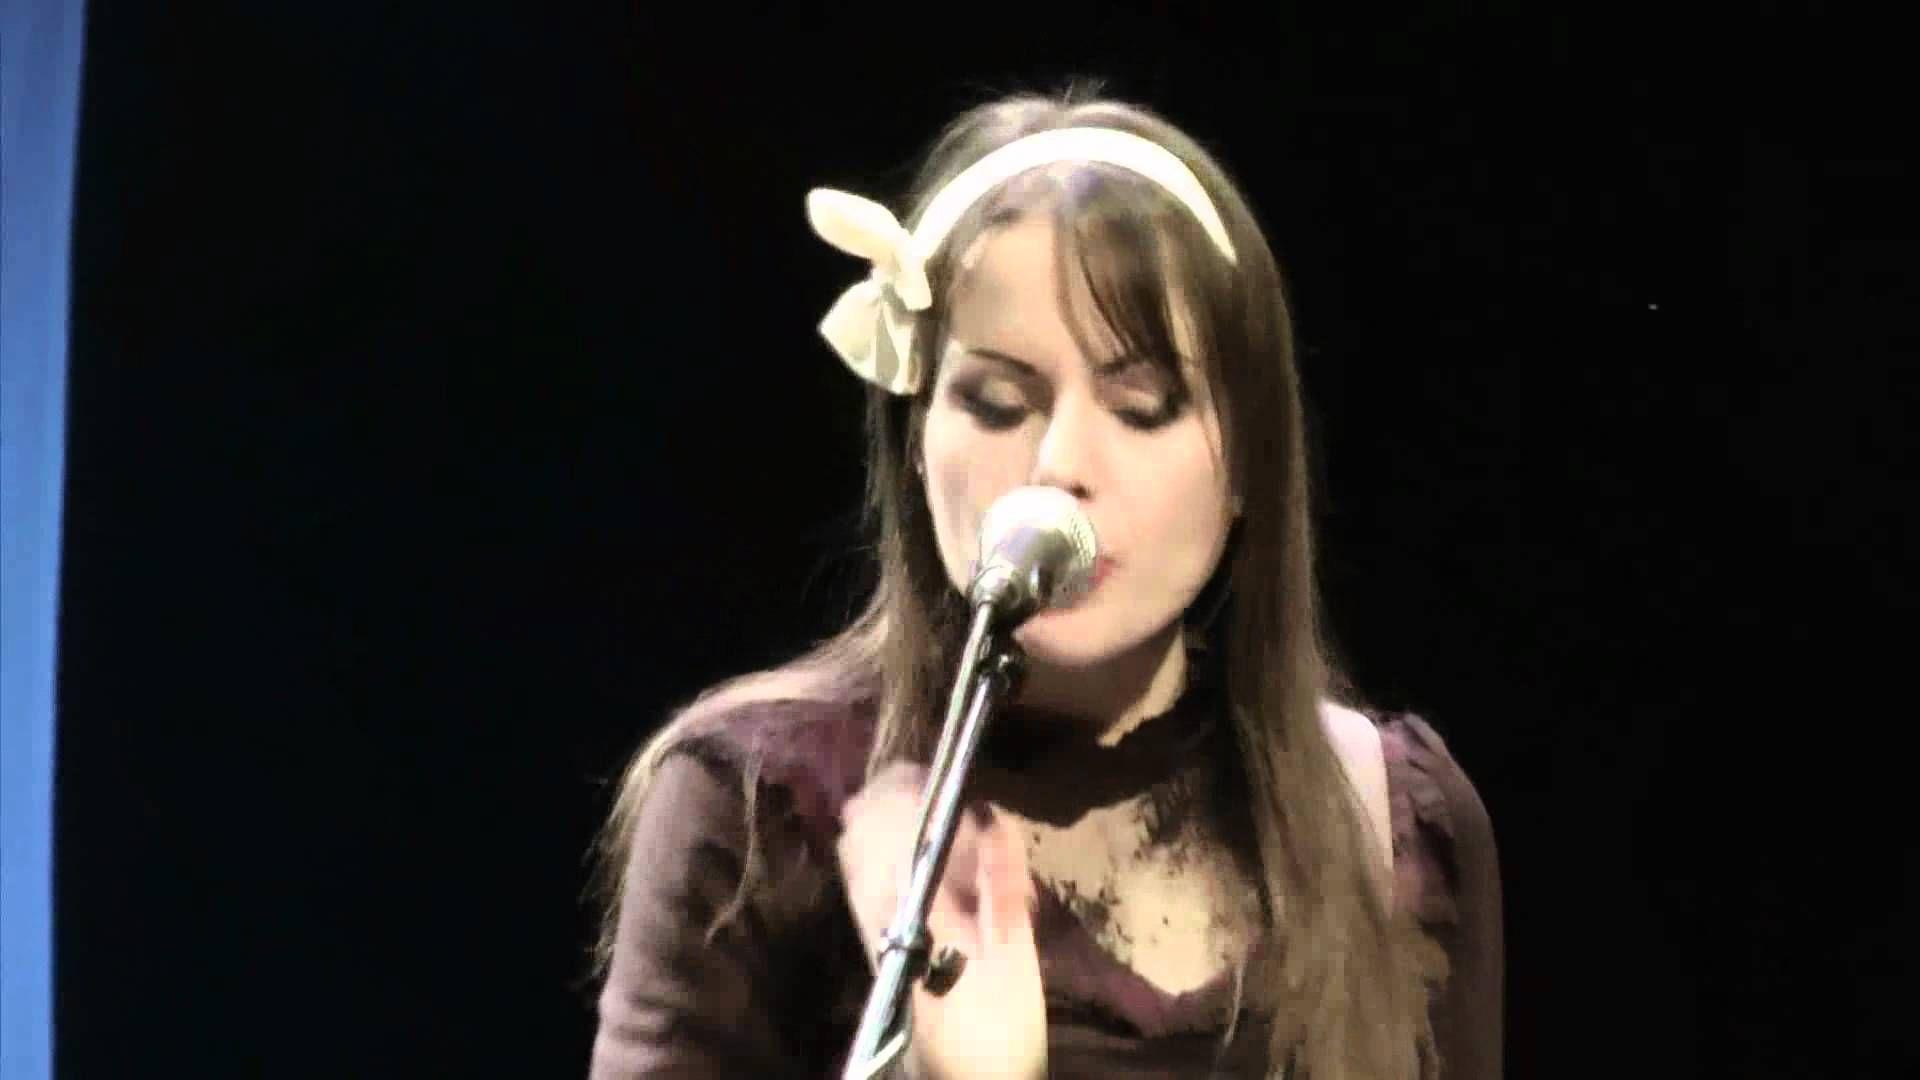 THE FALL LIVE - VILLETTE SONIQUE 2011